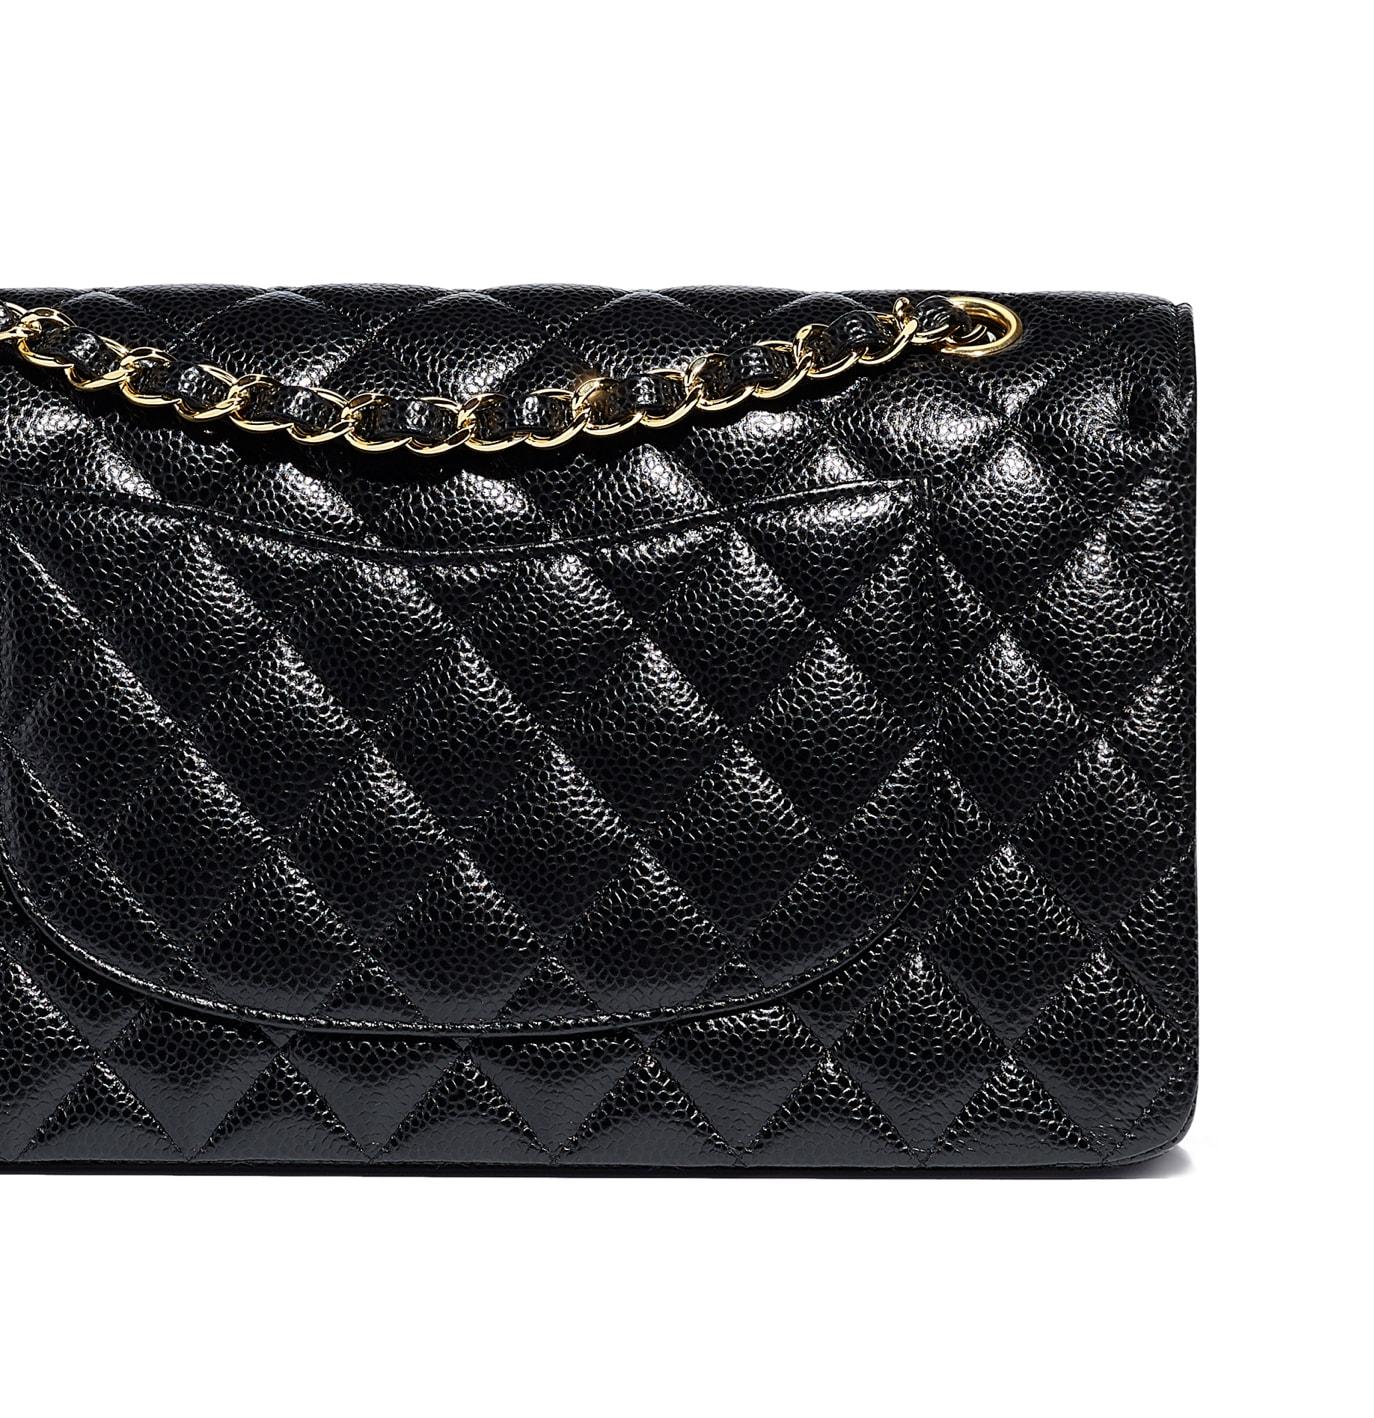 34f0243184 Classic - Handbags   CHANEL